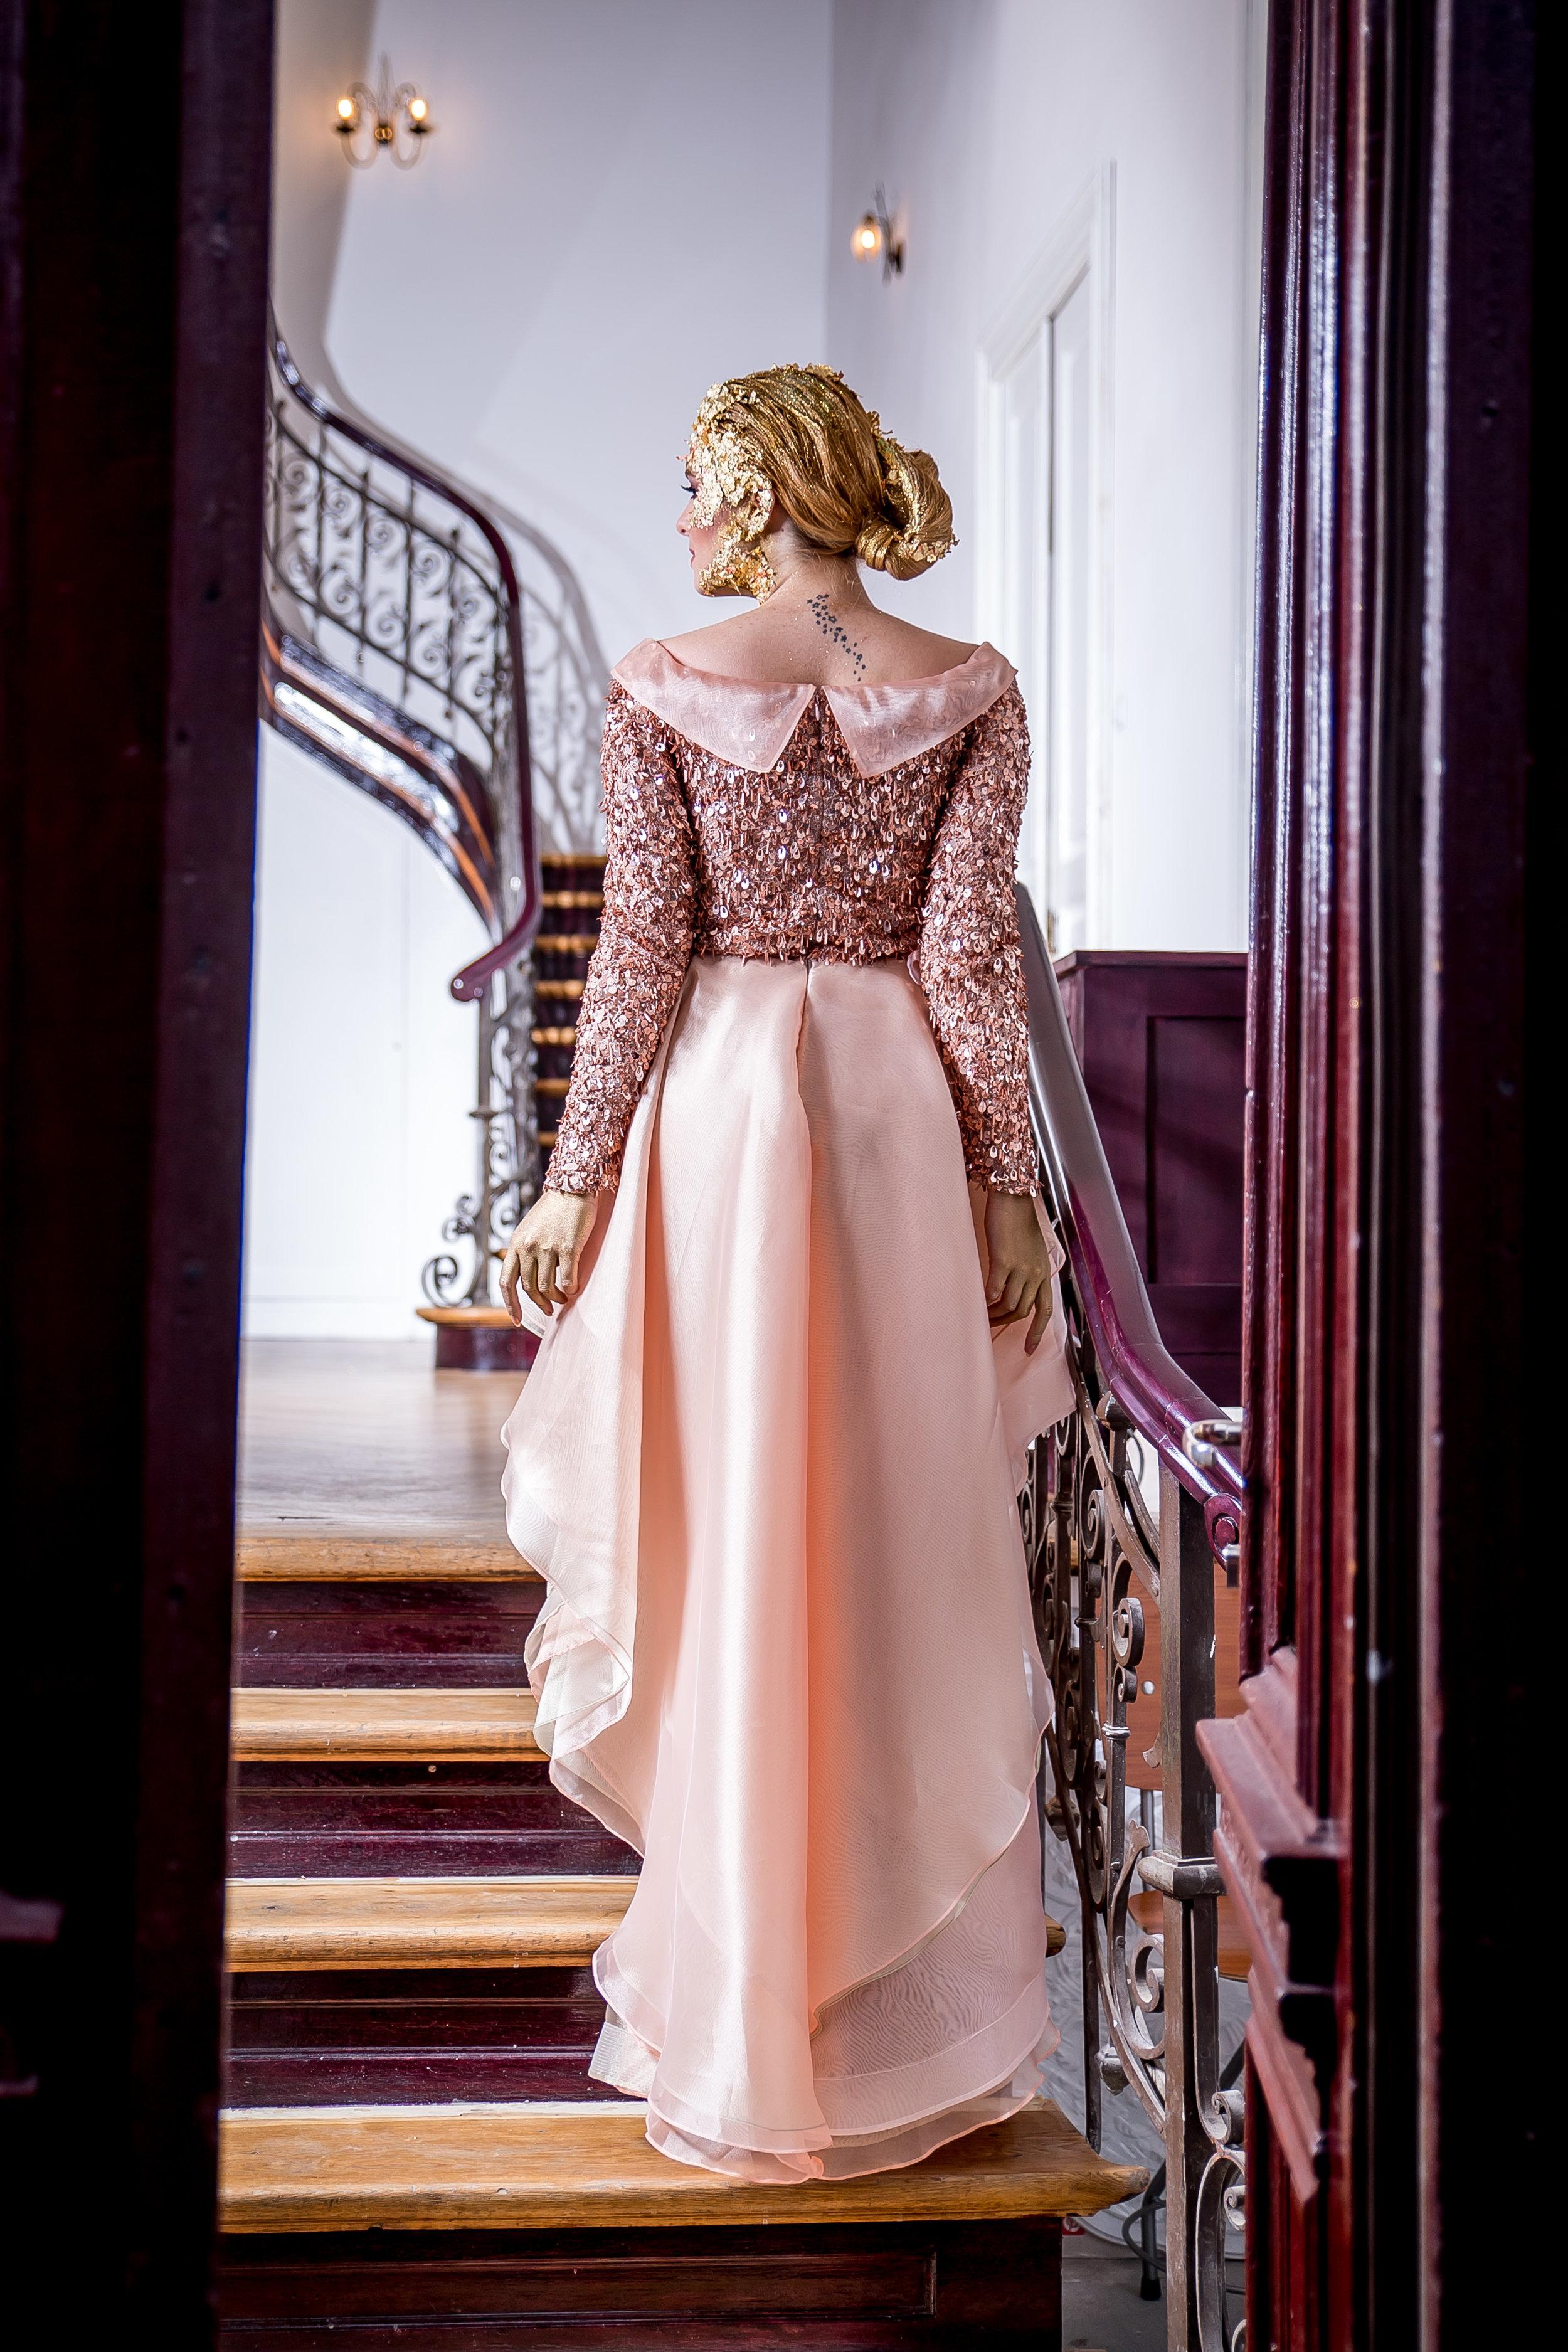 Halah Evening Dress 2018 Golden Shades Fashion by Laina